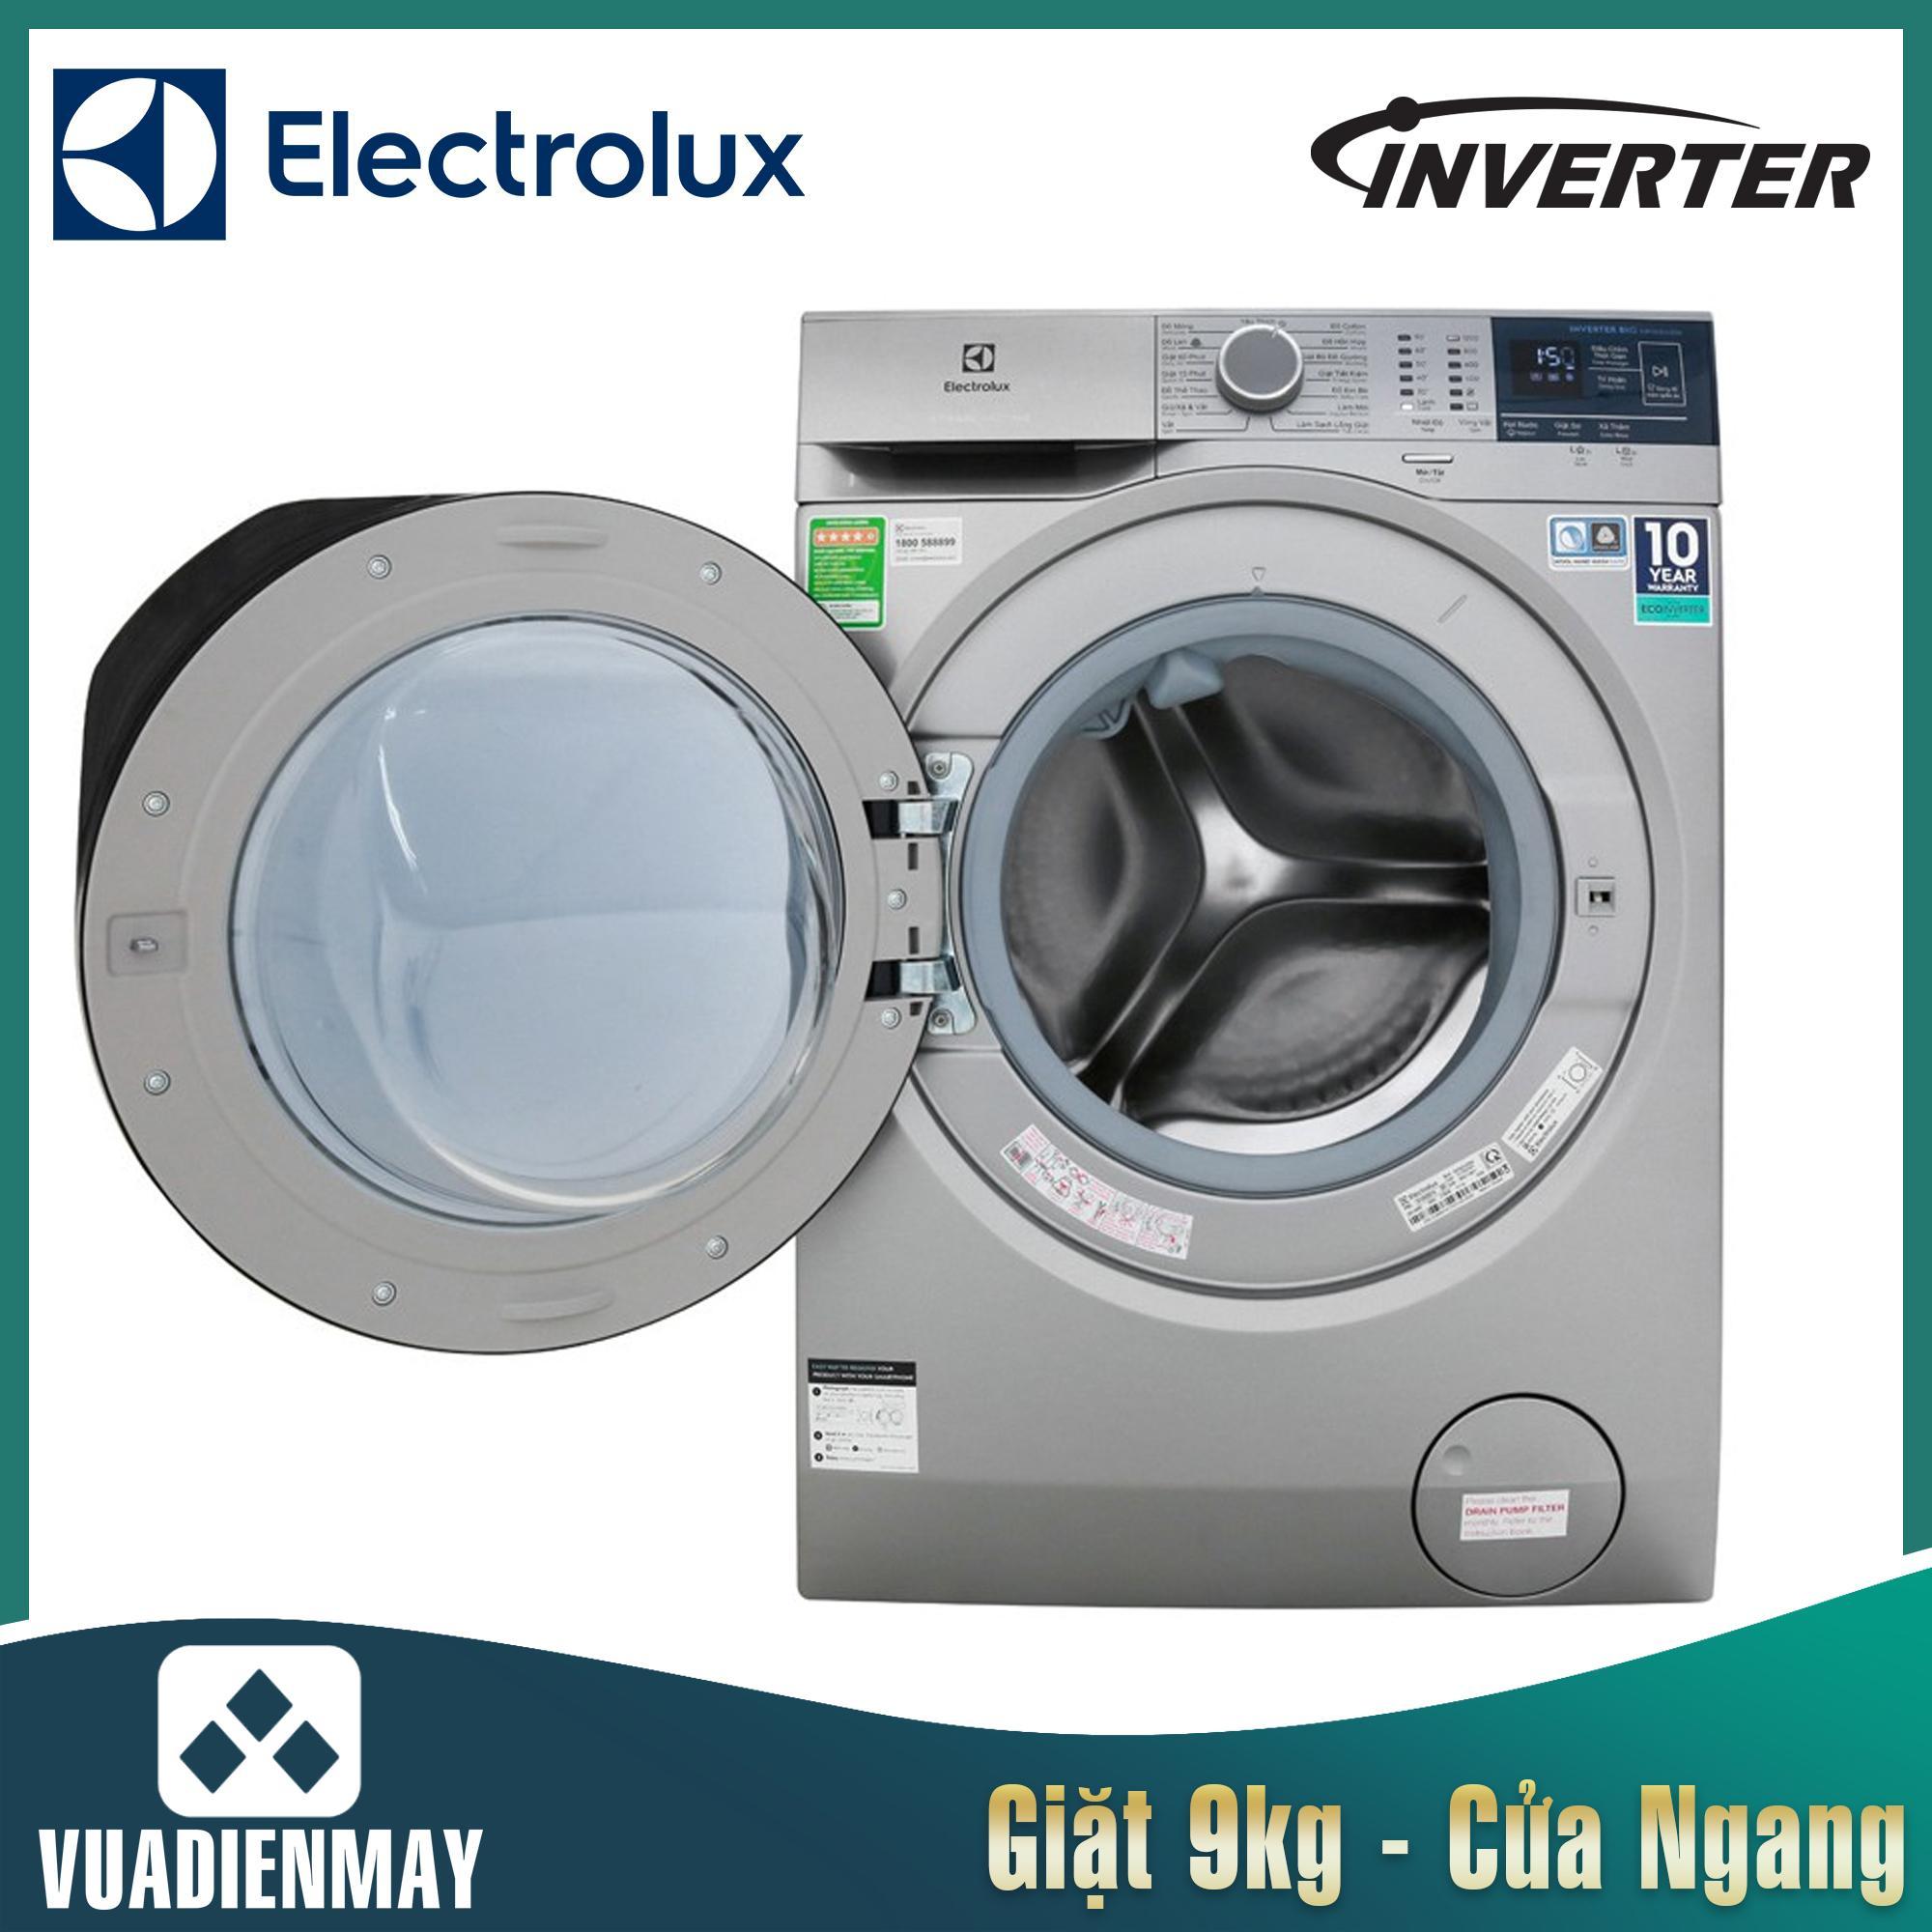 Máy giặt Electrolux 9kg lồng ngang inverter 9024AD